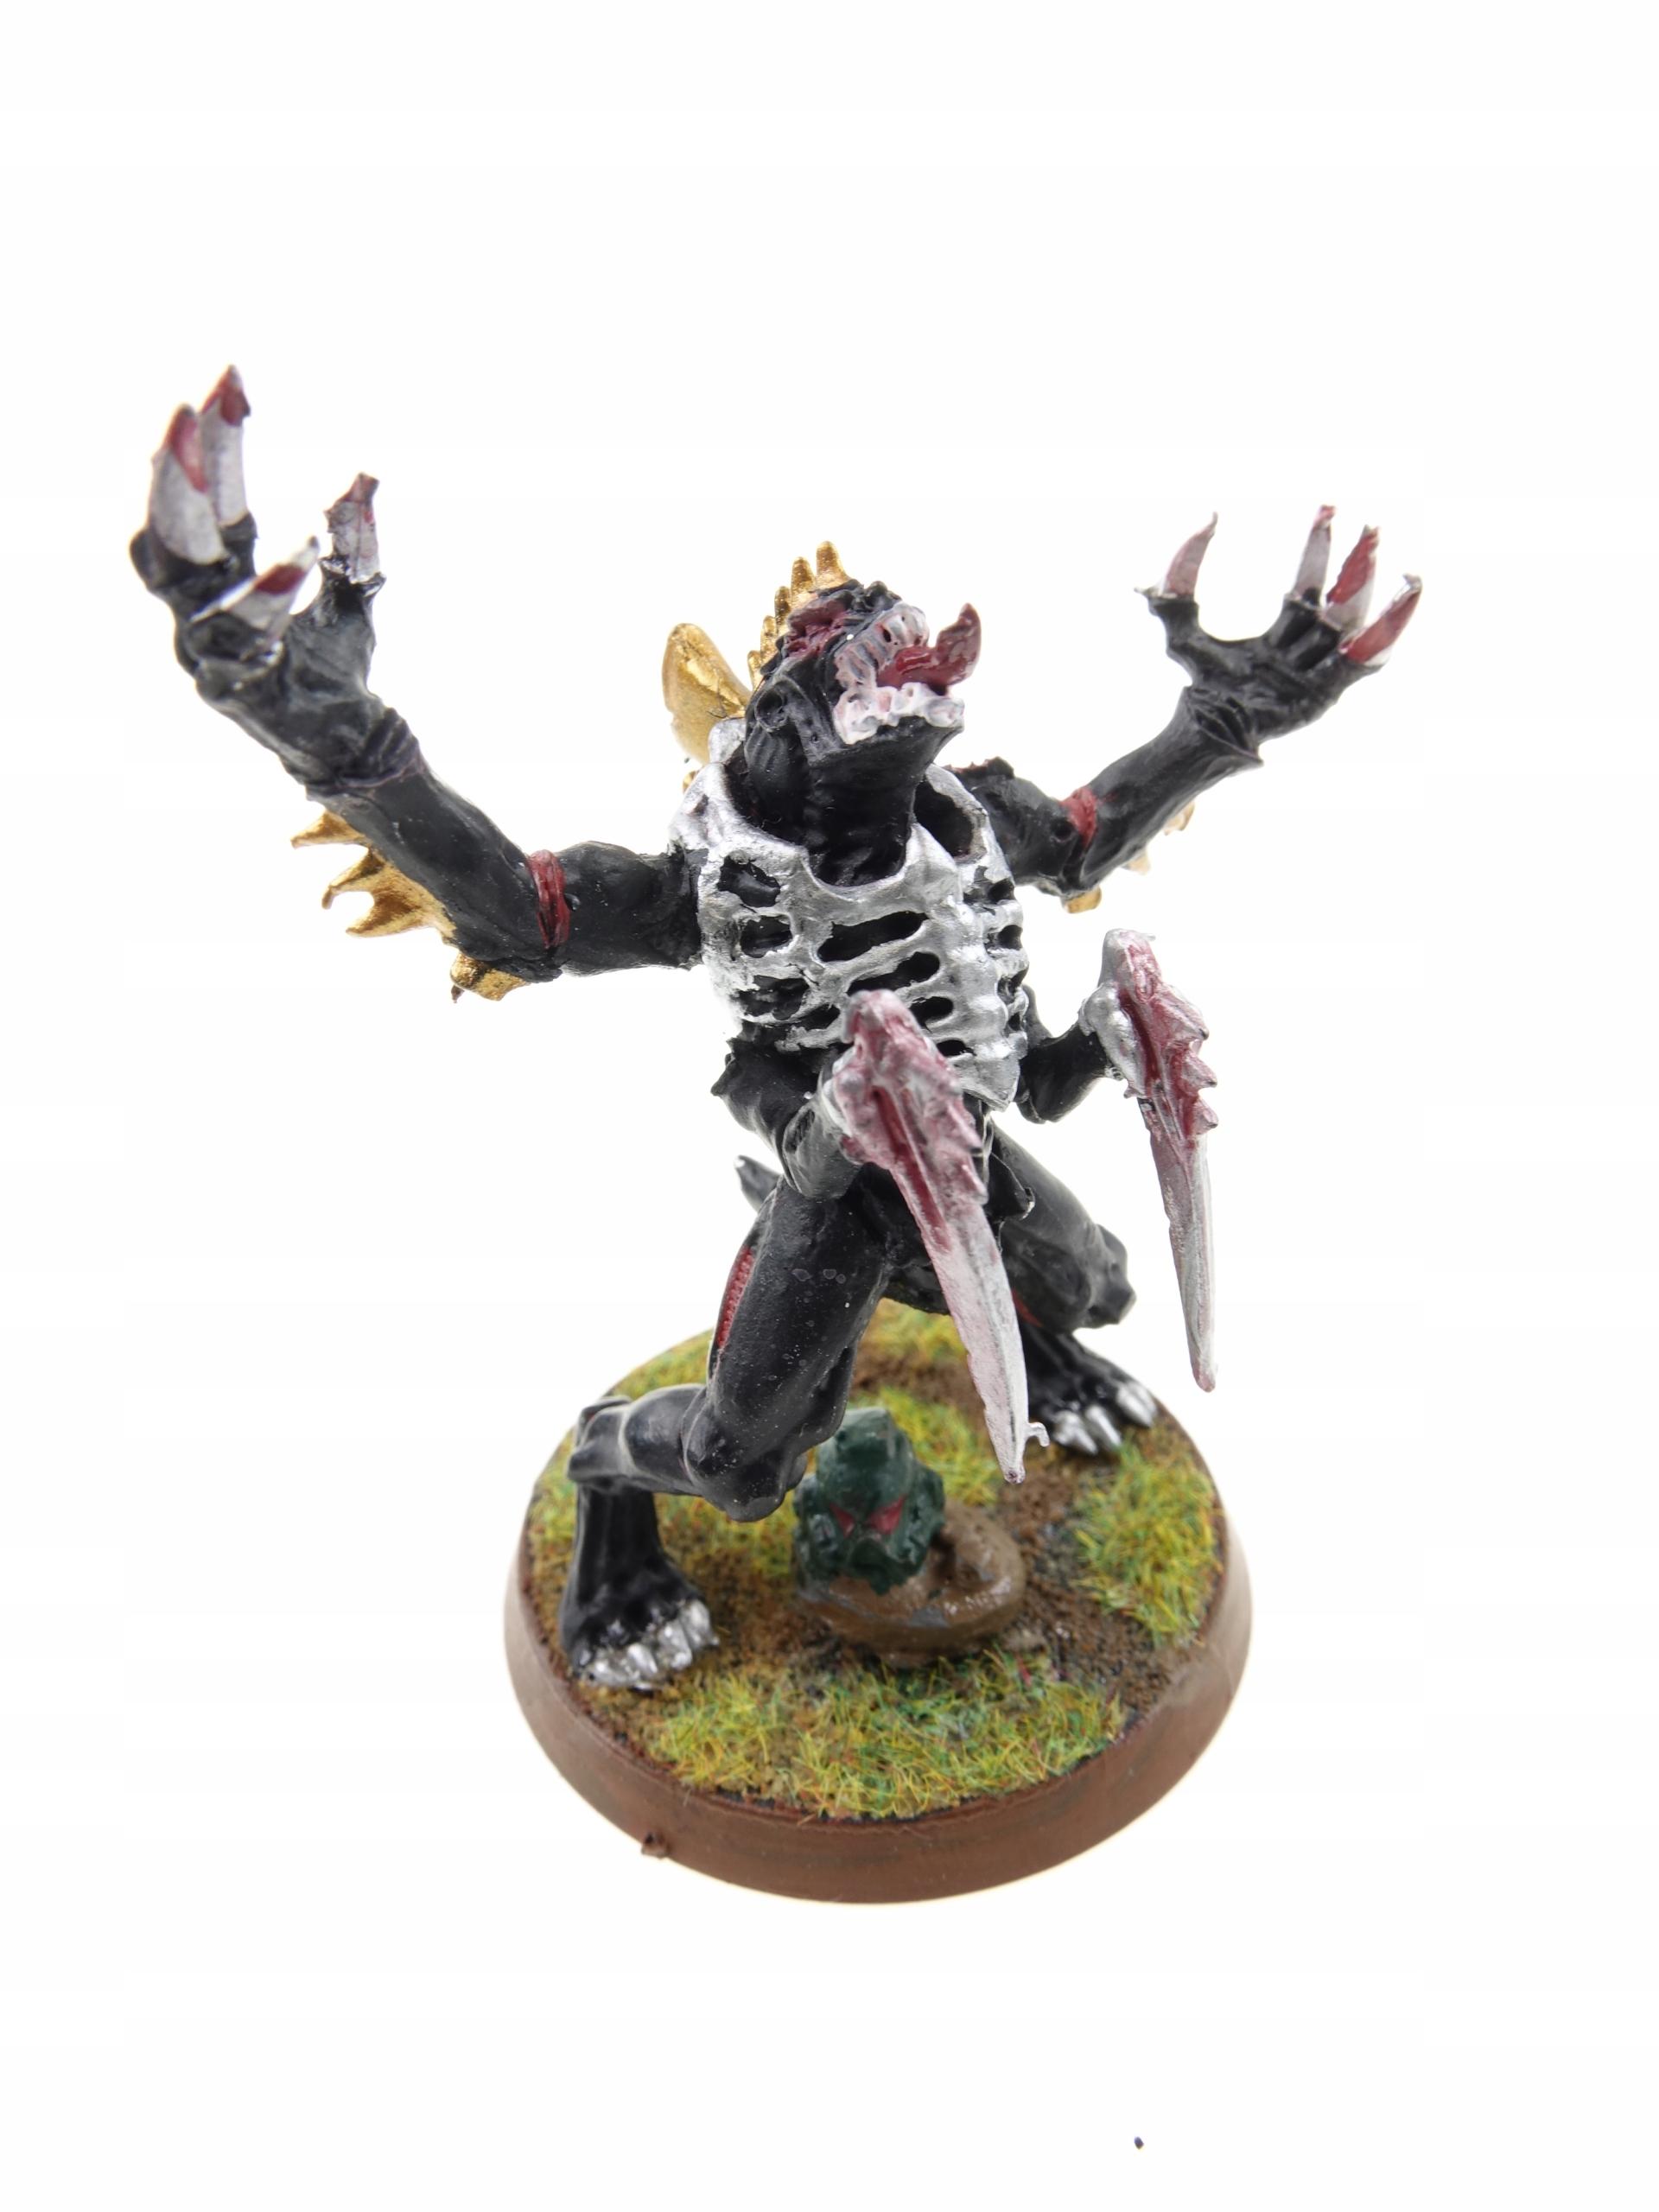 Warhammer 40k Tyranid Broodlord Figurka Metal 59 99 Zl Stan Uzywany 10090024943 Allegro Pl